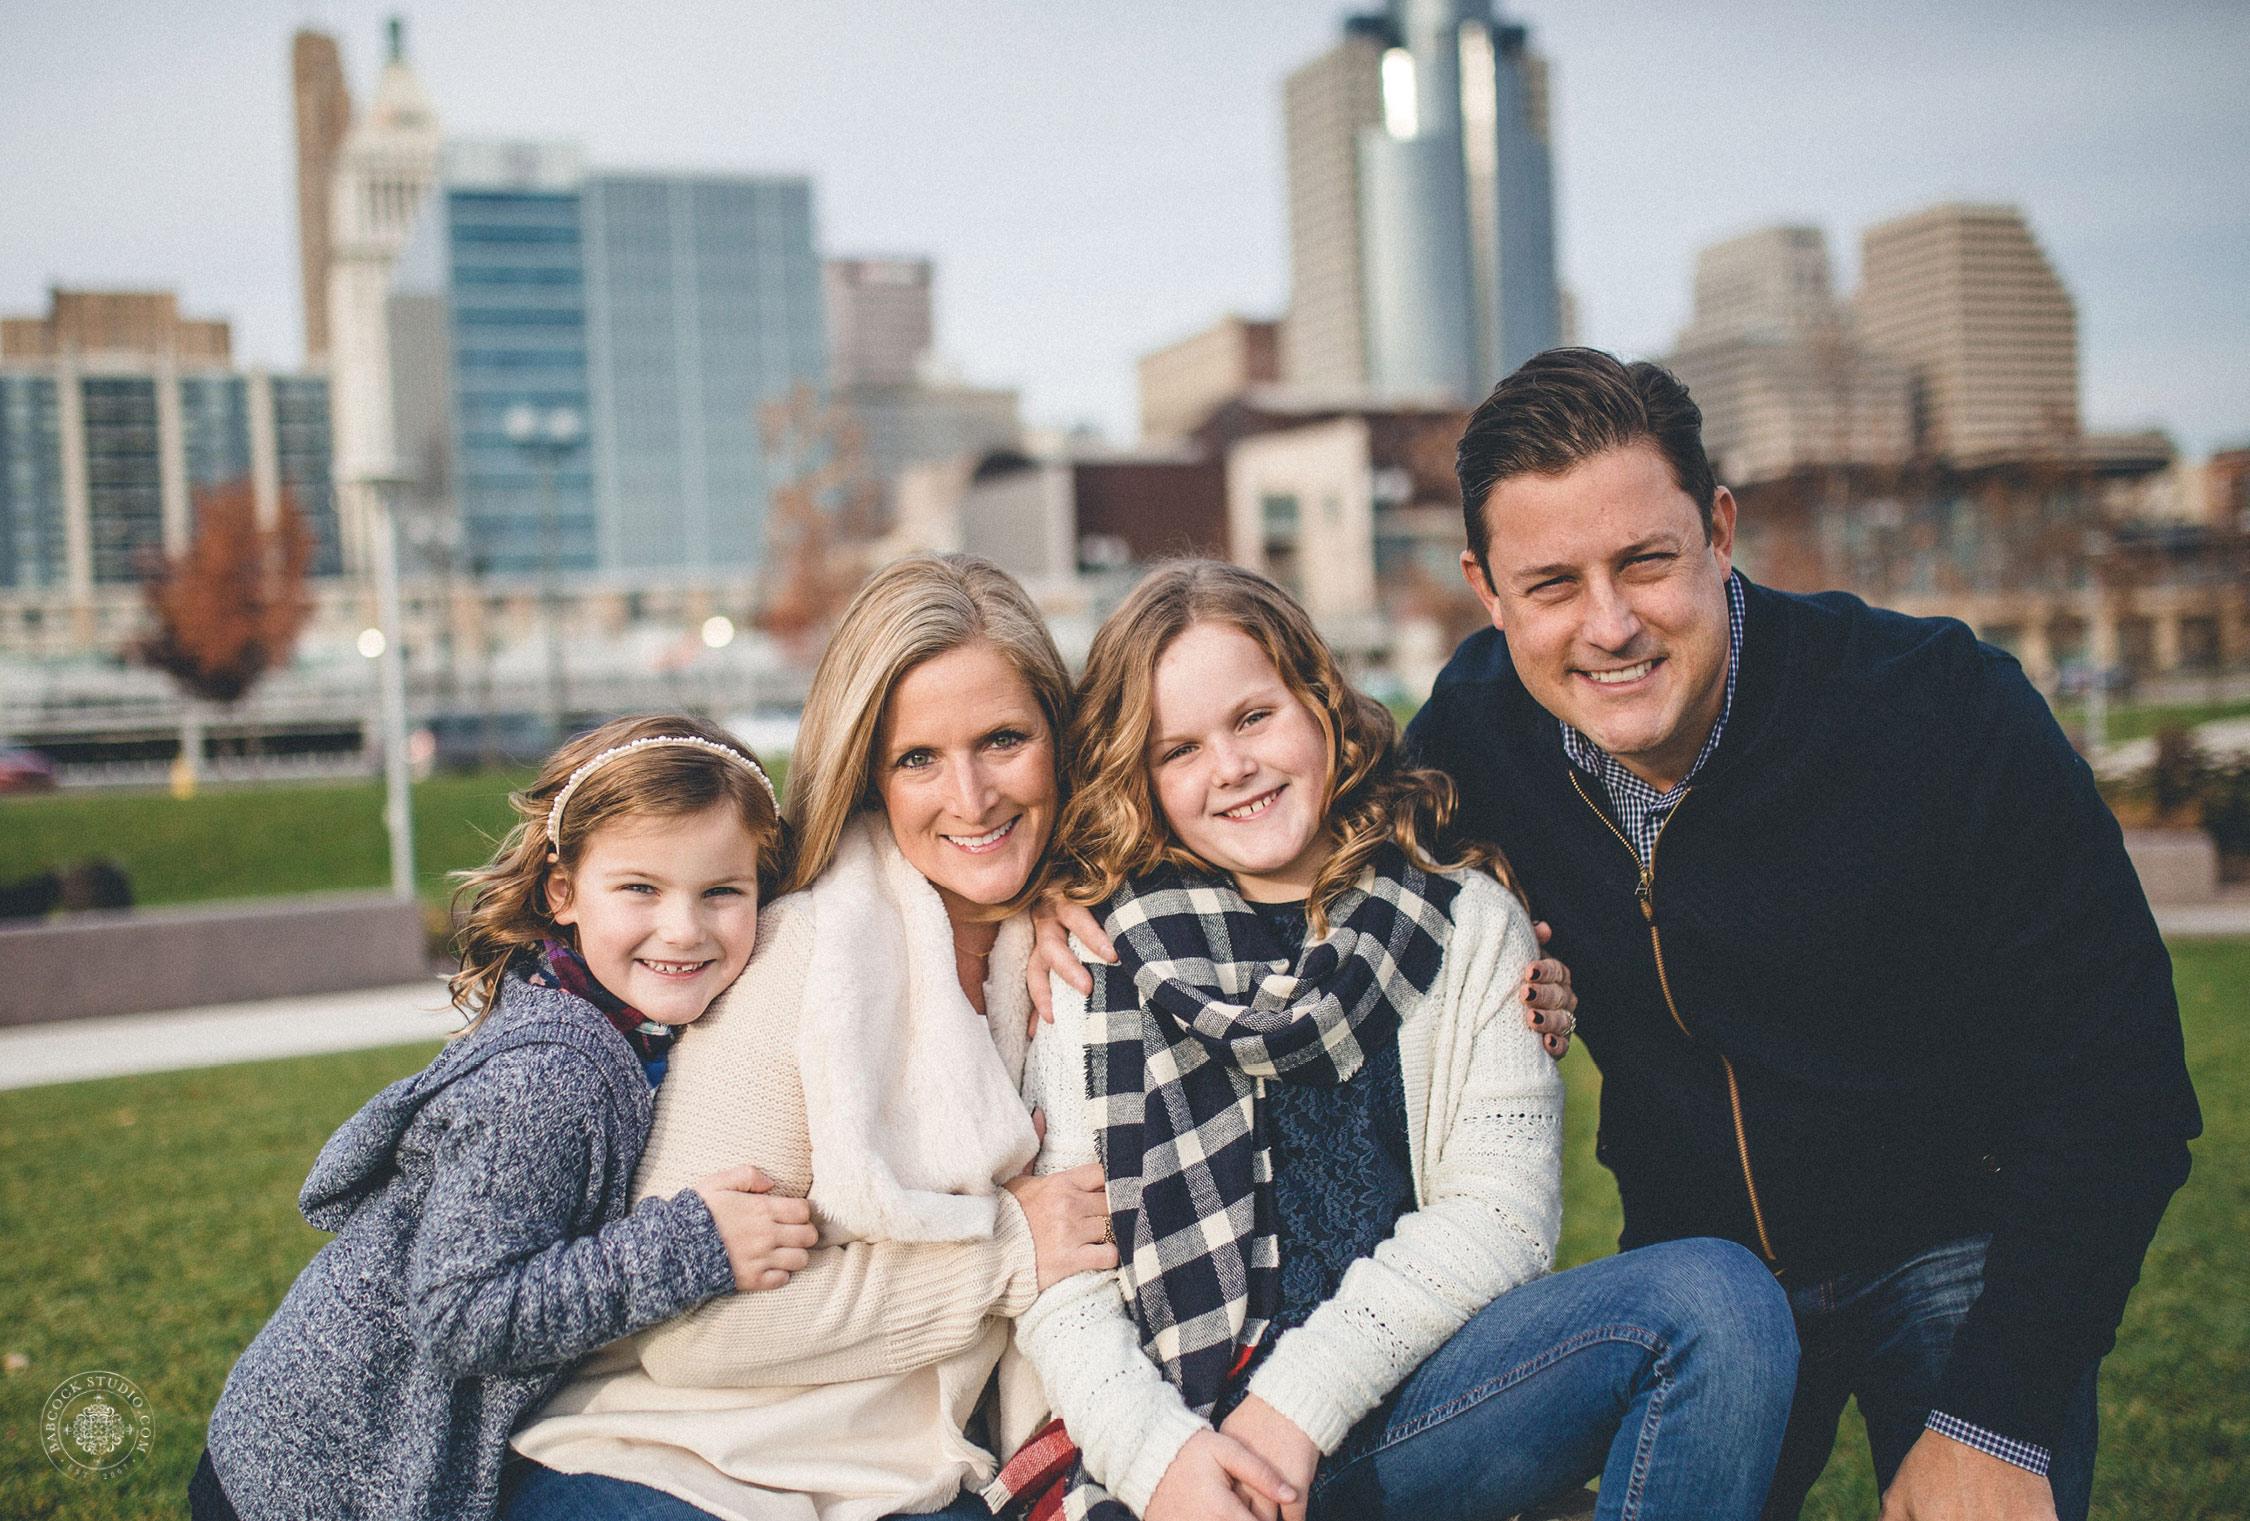 matichel-family-photographer-cincinnati-ohio-3.jpg